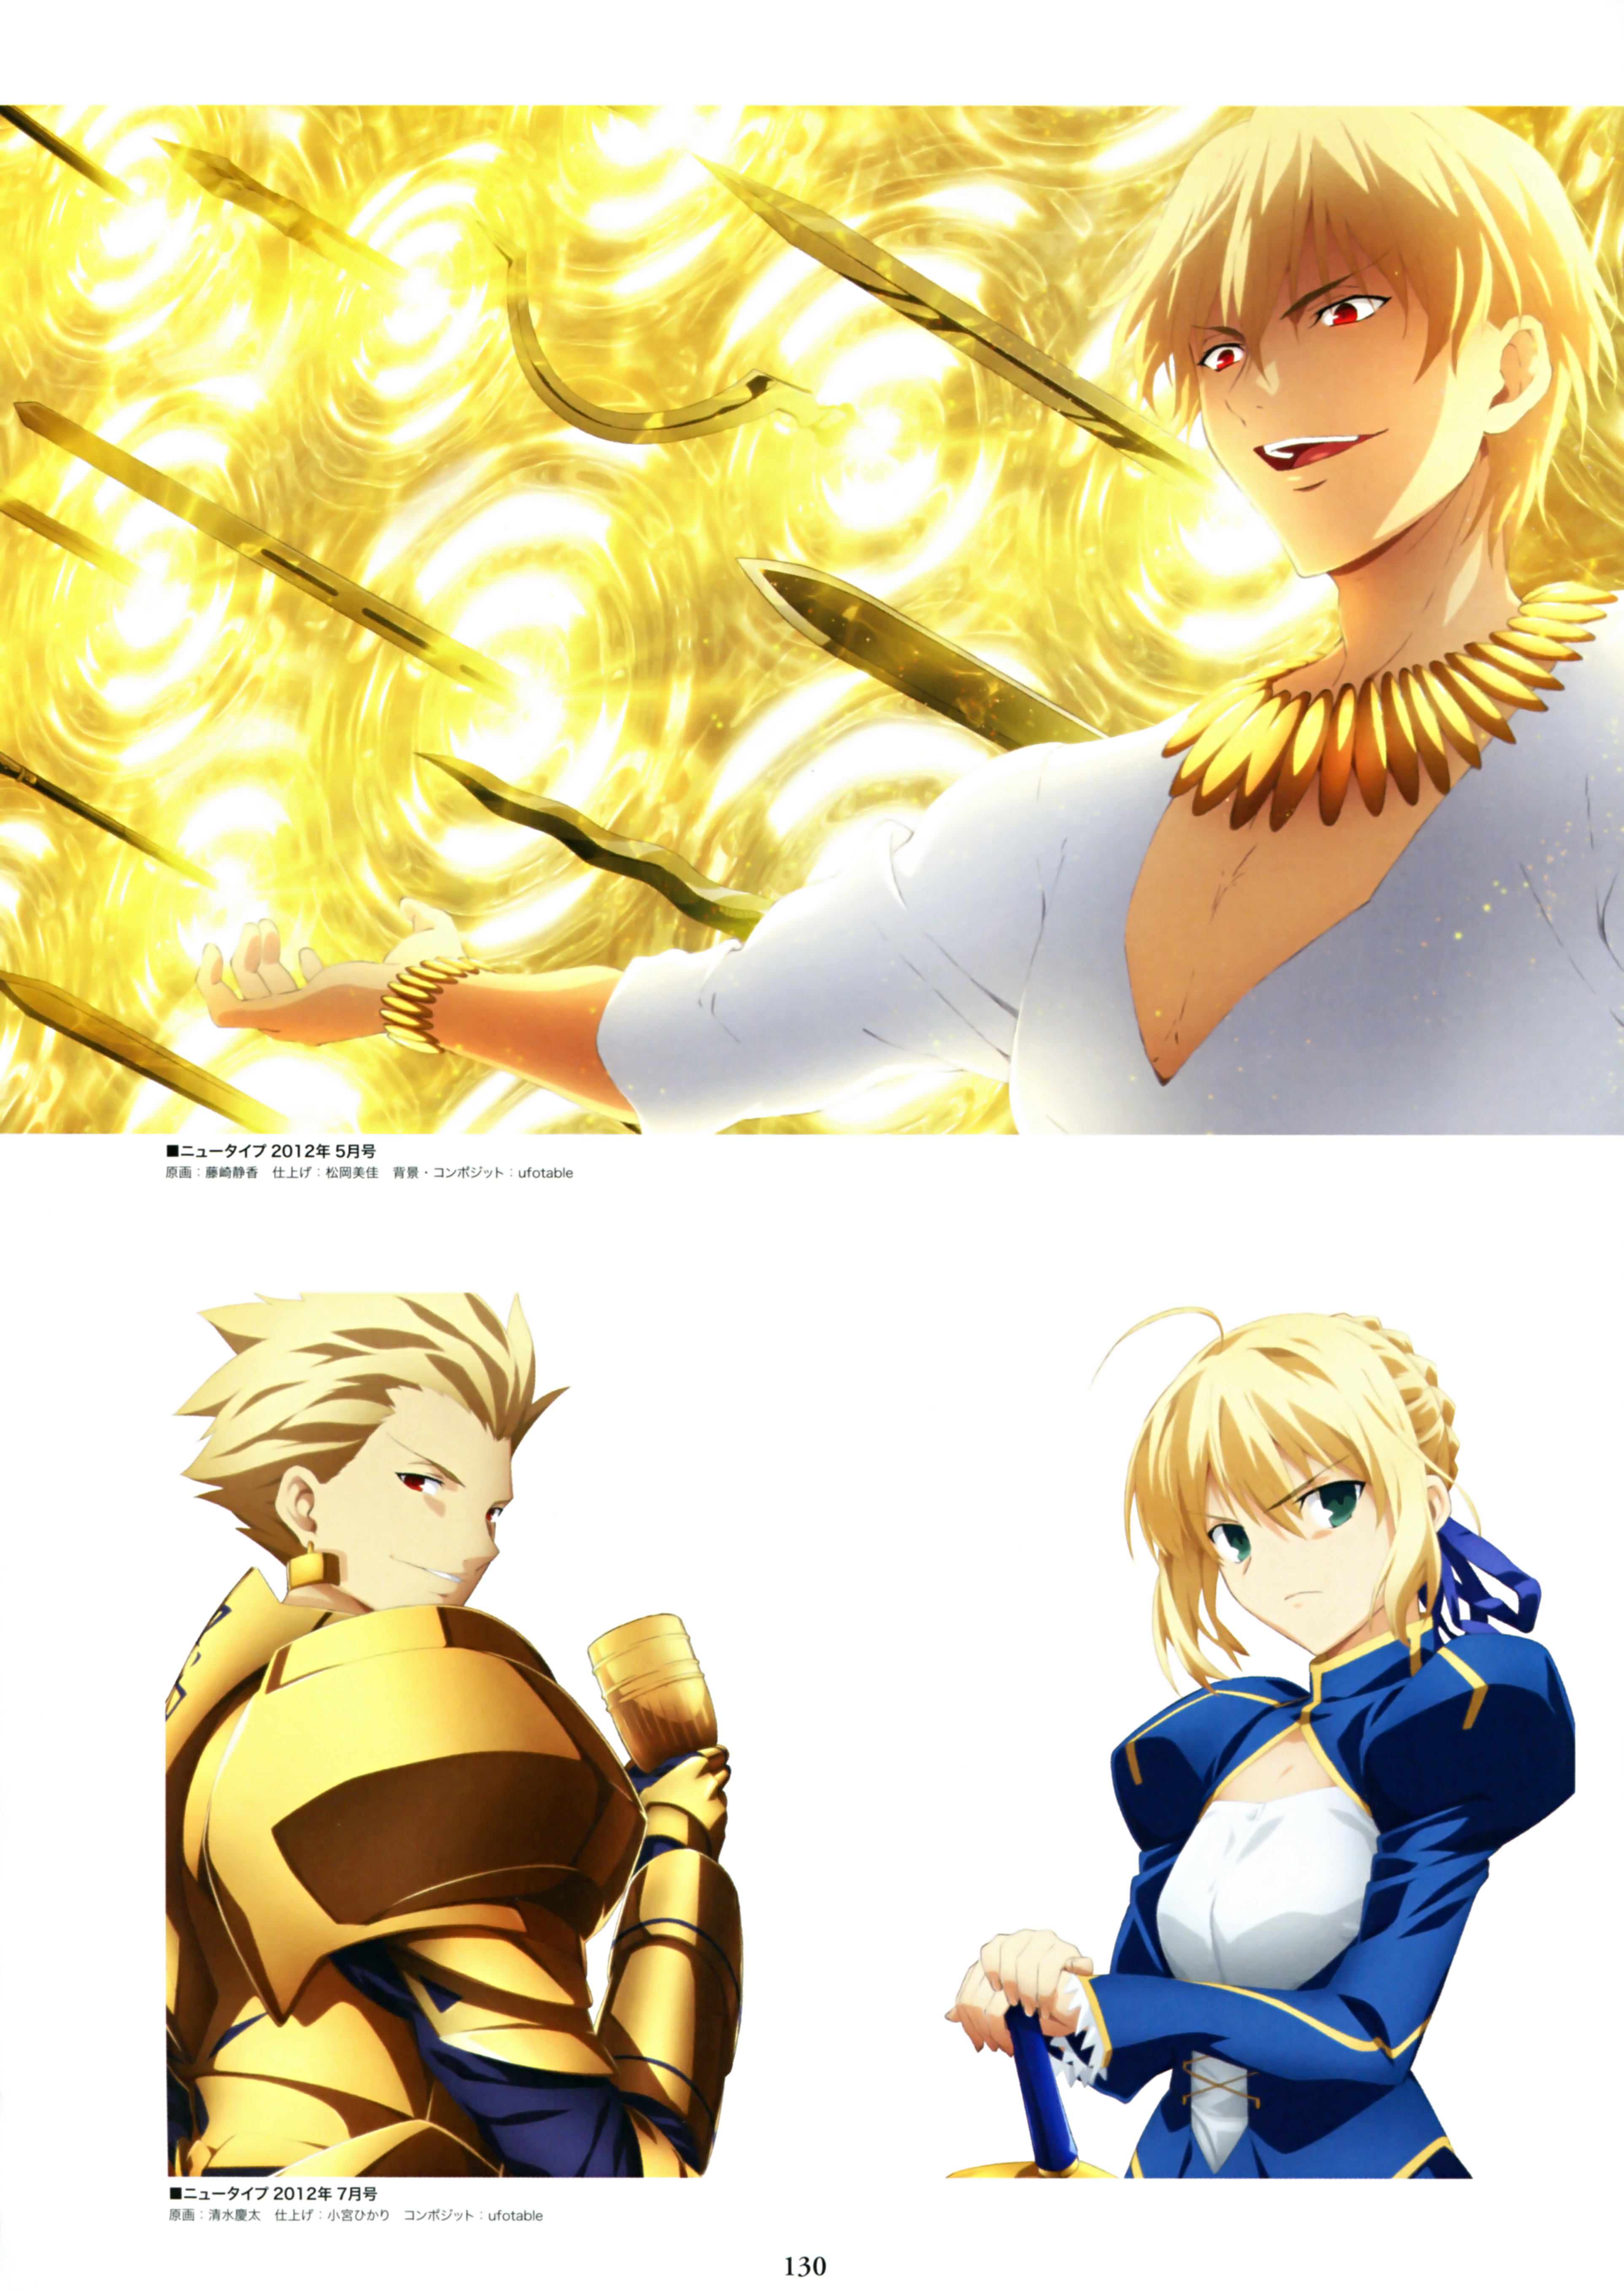 Fate Zero Mobile Wallpaper 1392227 Zerochan Anime Image Board